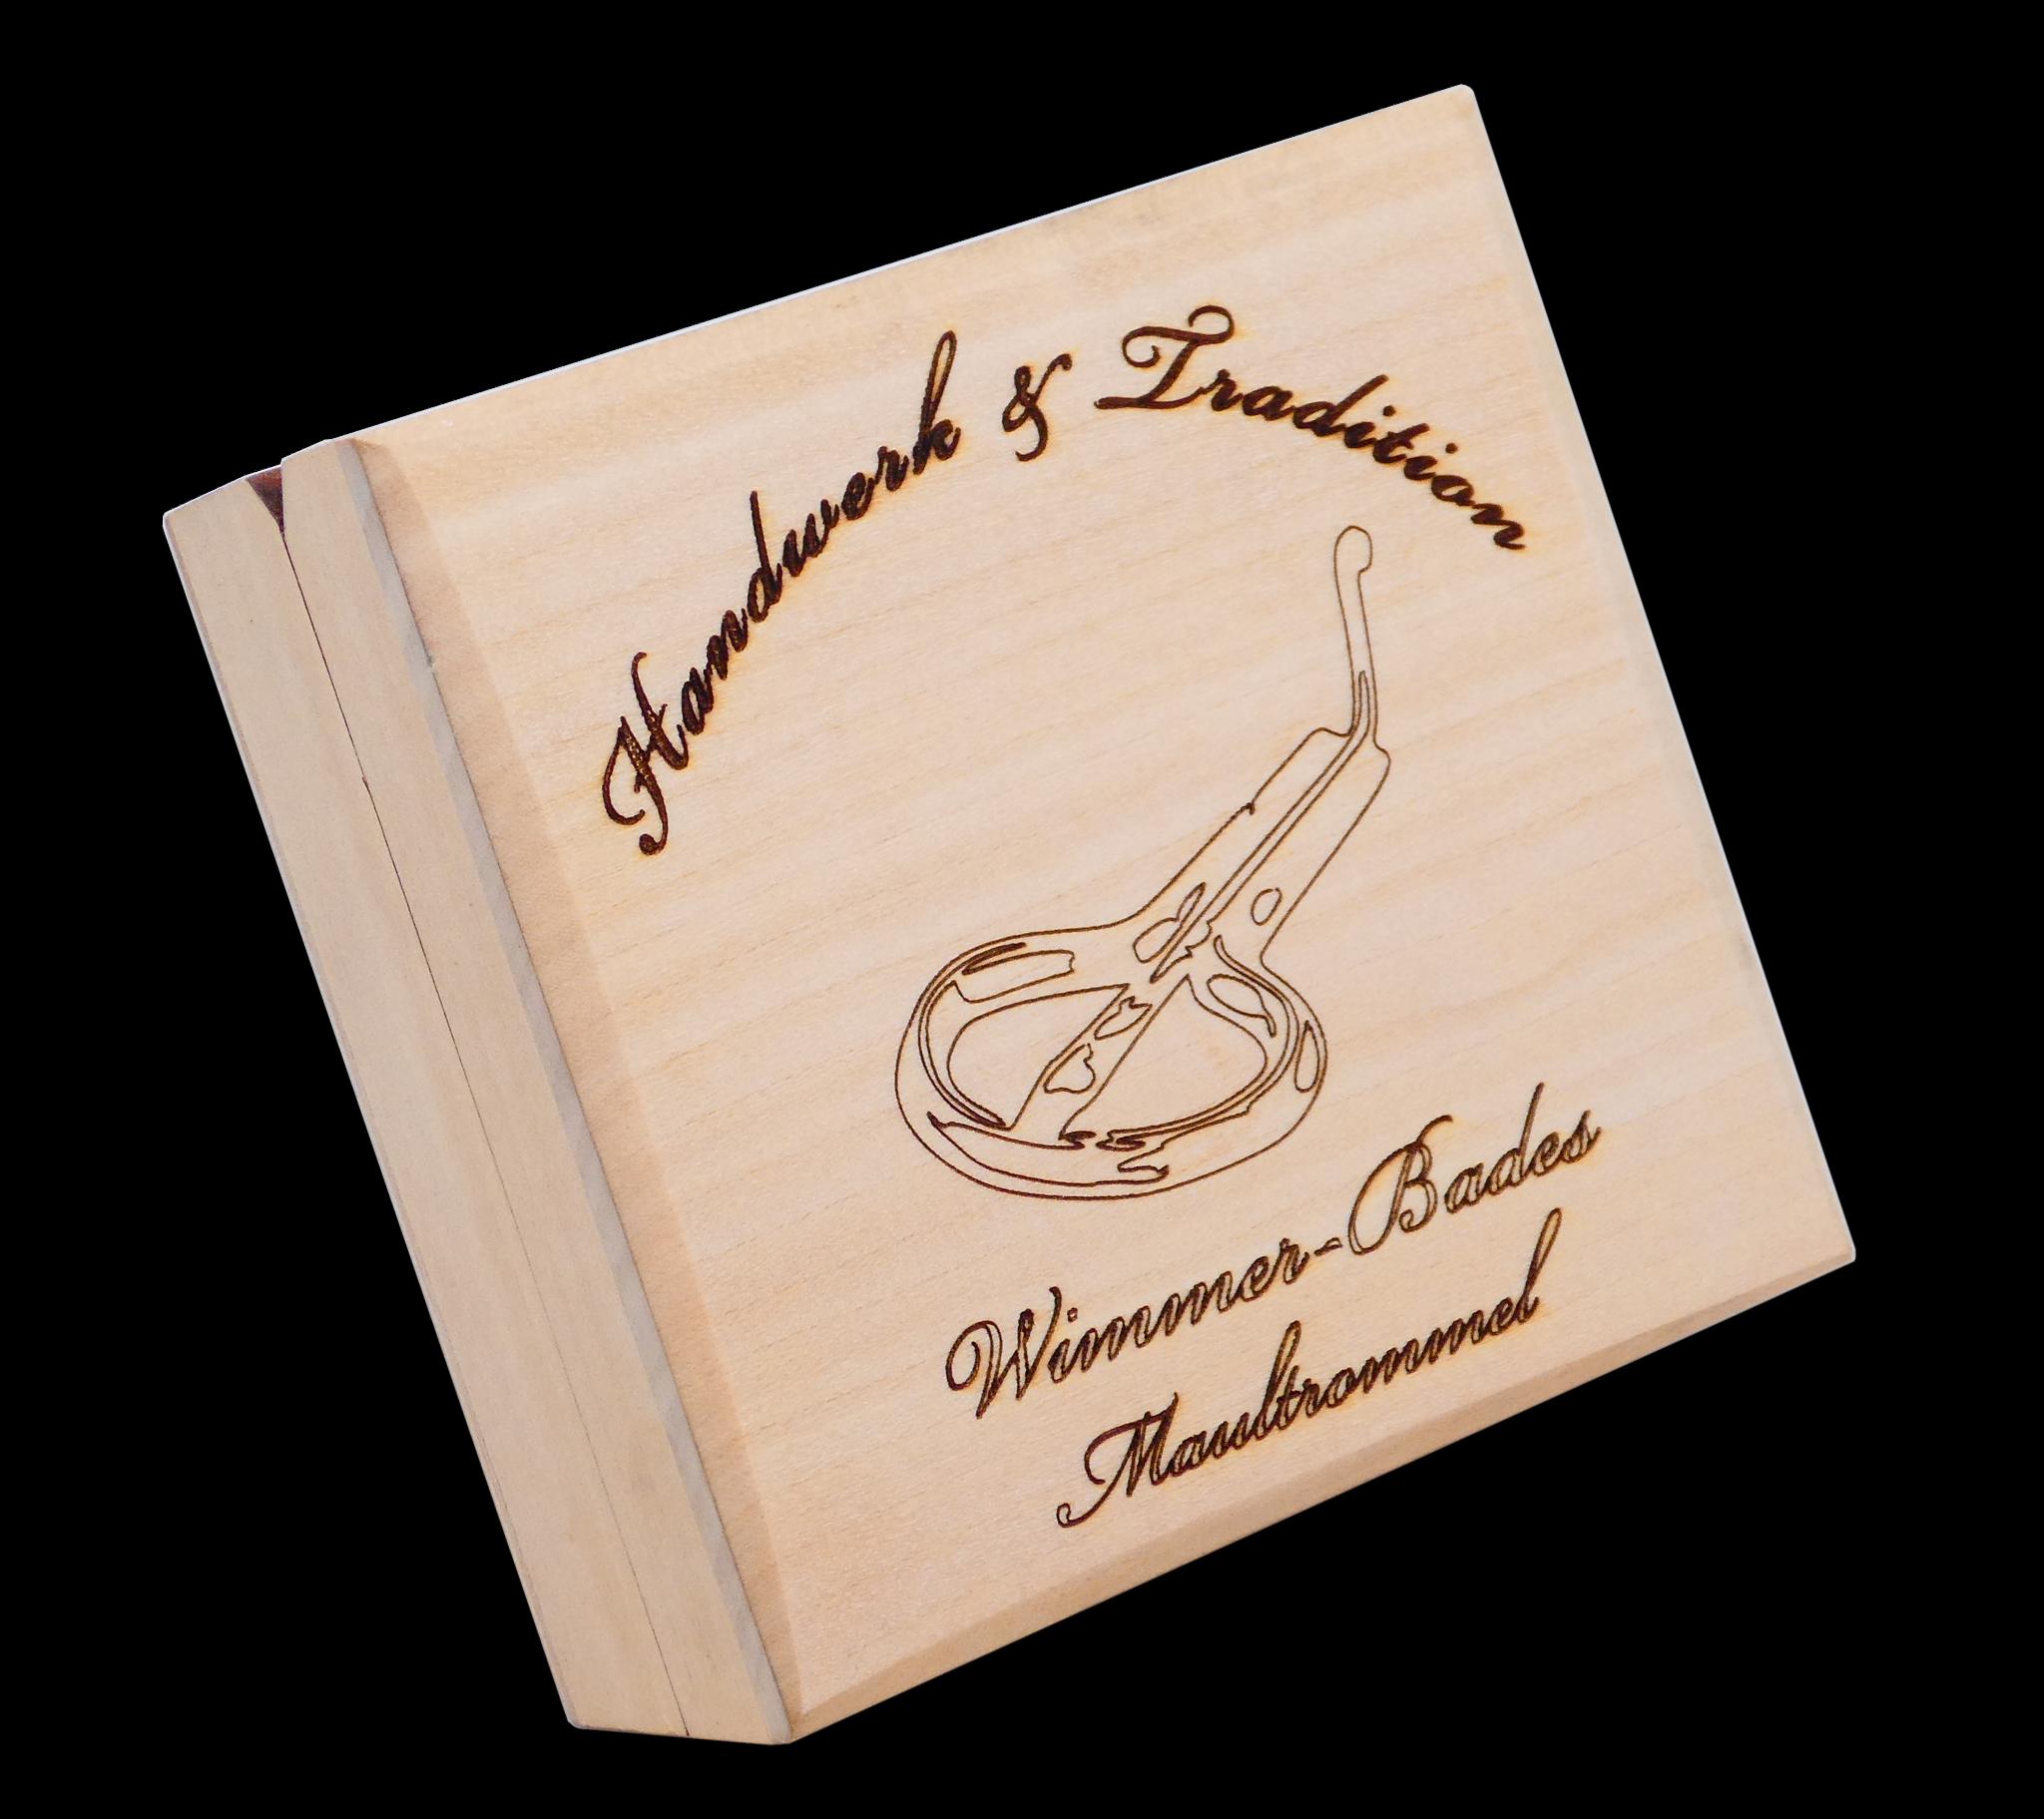 WIMMER-BADES MAULTROMMELN HANDWERK & TRADITION - GOLD MAULTROMMEL IN HOLZKASSETTE